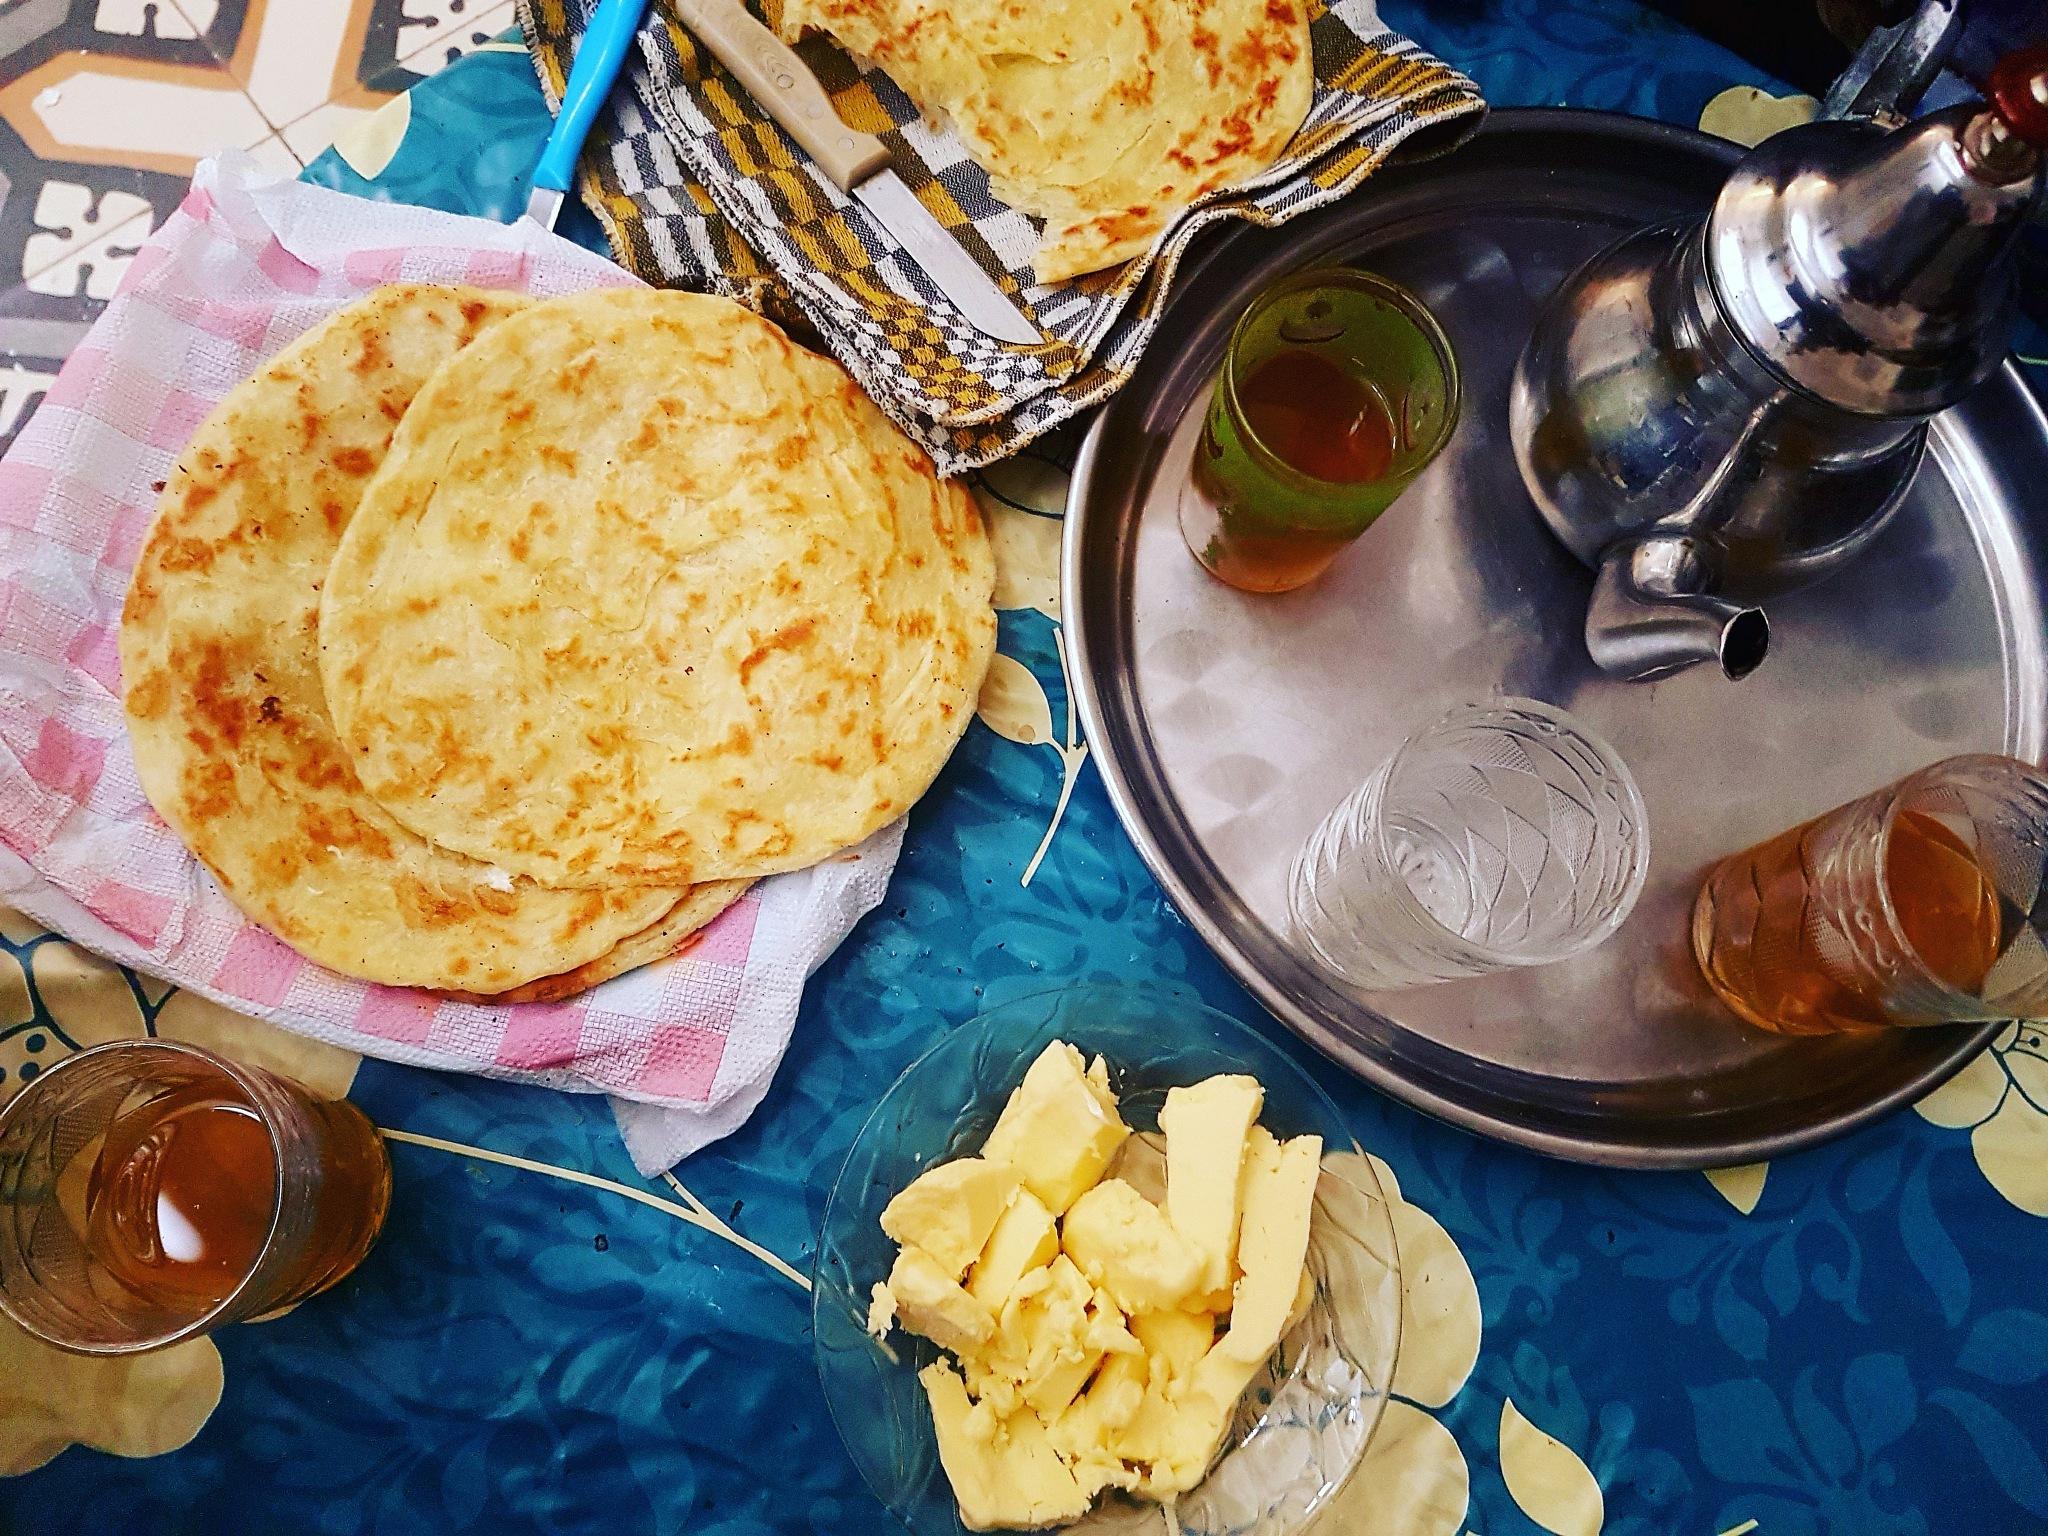 Moroccan Culture by Ziyad Mourabiti